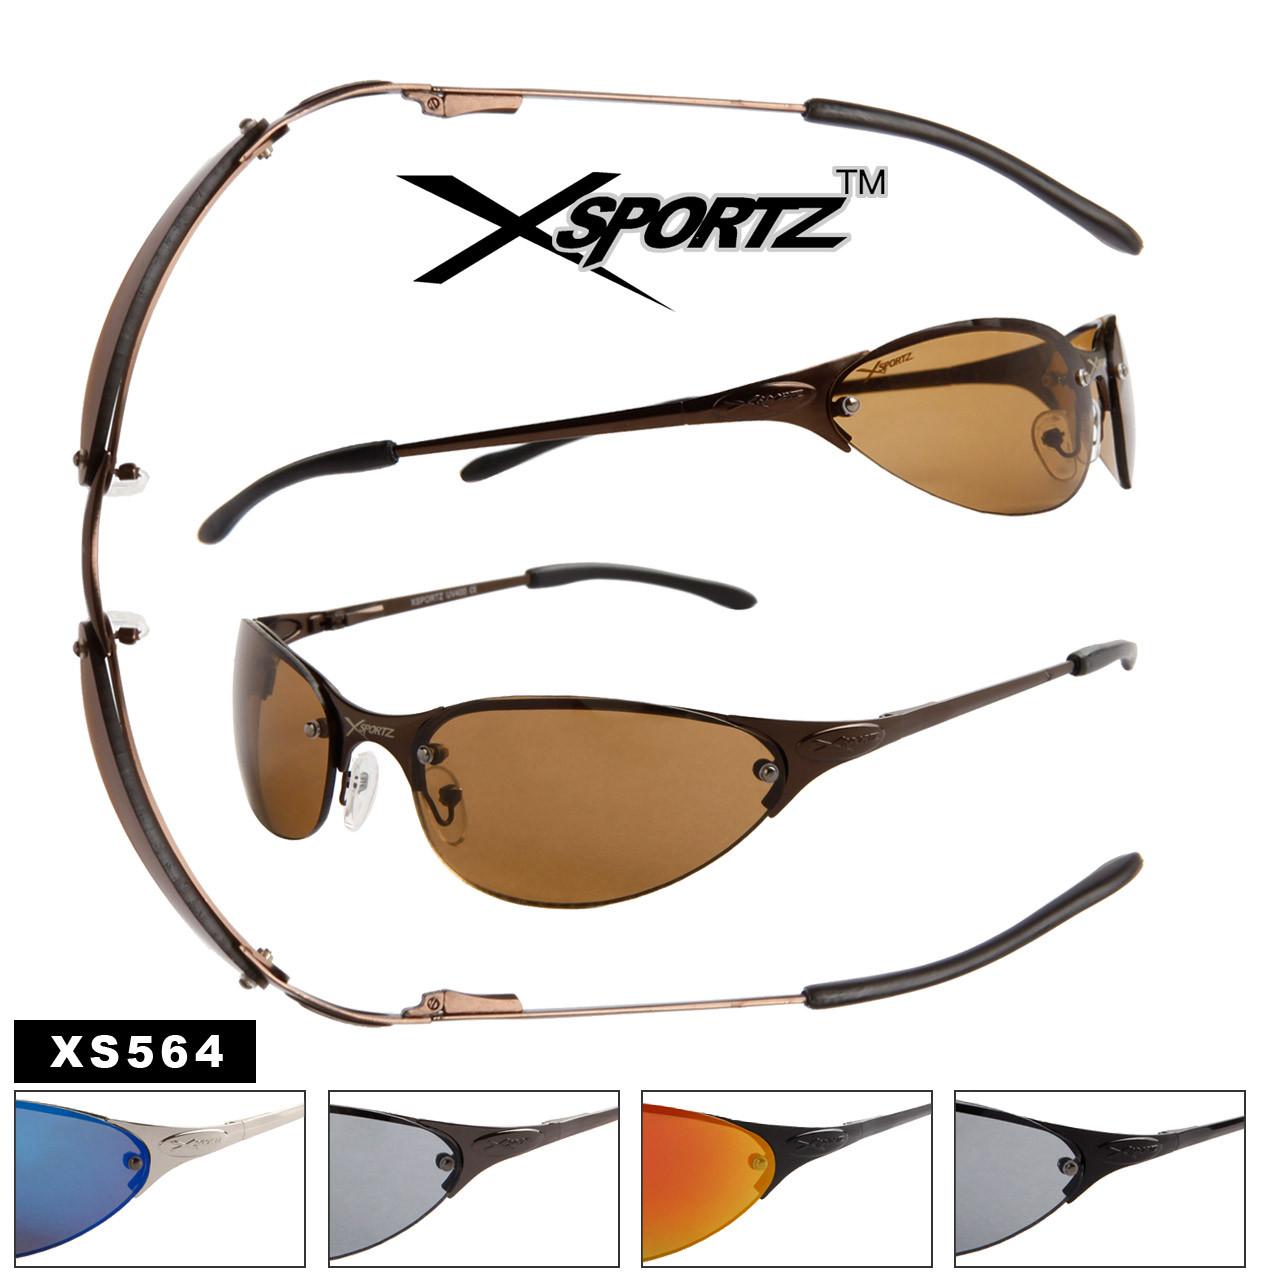 Xsportz™ Sports Sunglasses Wholesale - Style #XS564